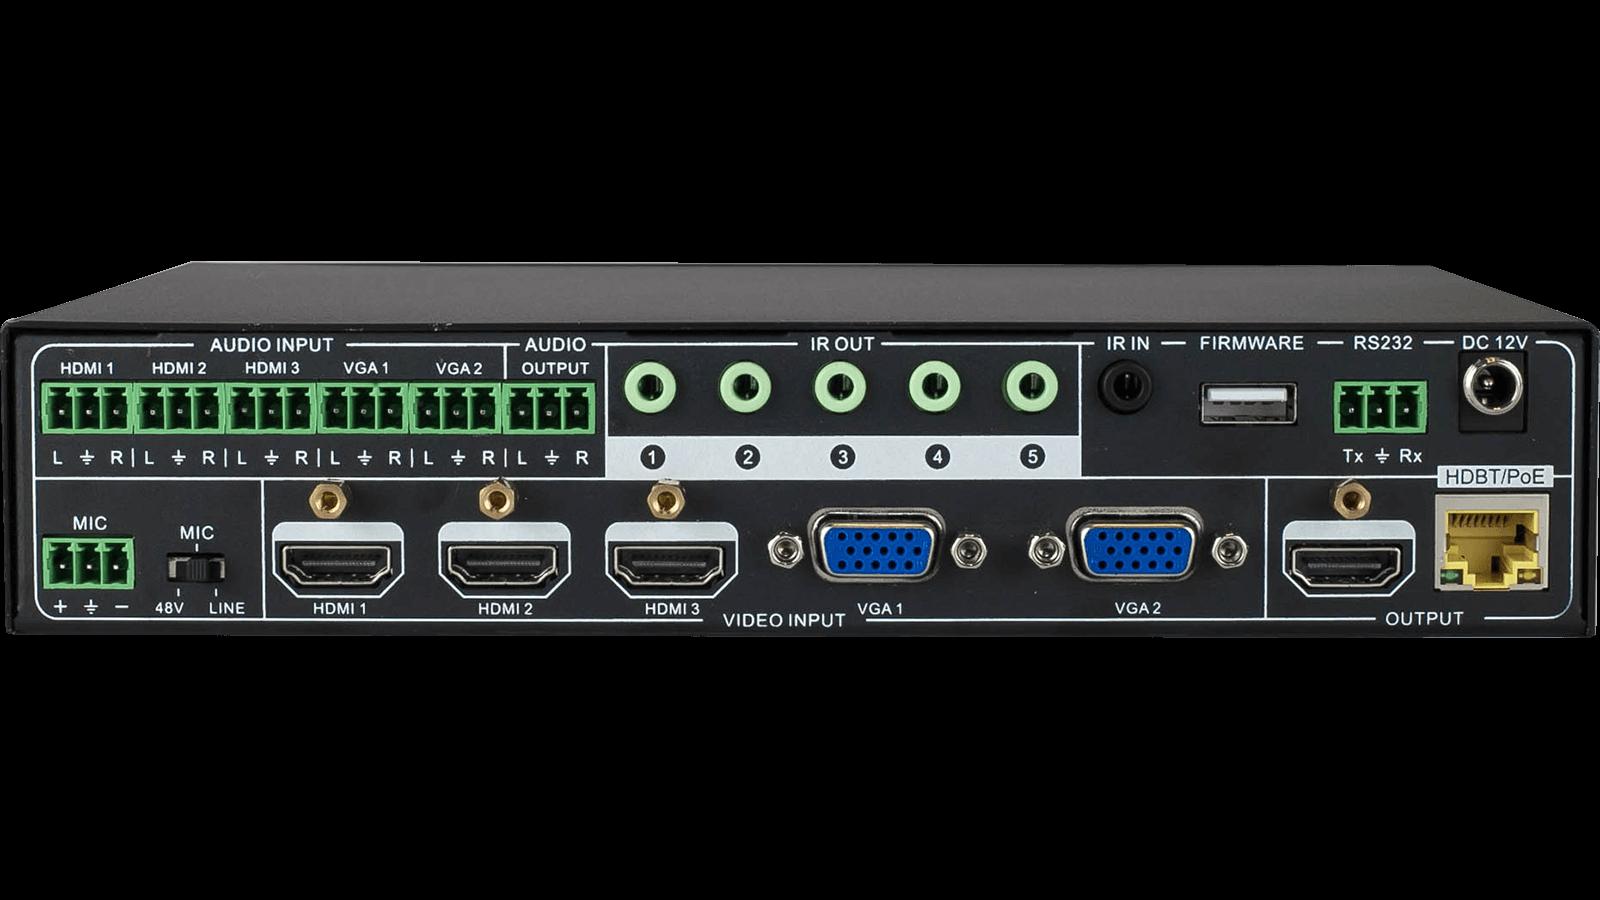 Intelix Digi P52 3 Hdmi 2 Vga Presentation Auto Switcher